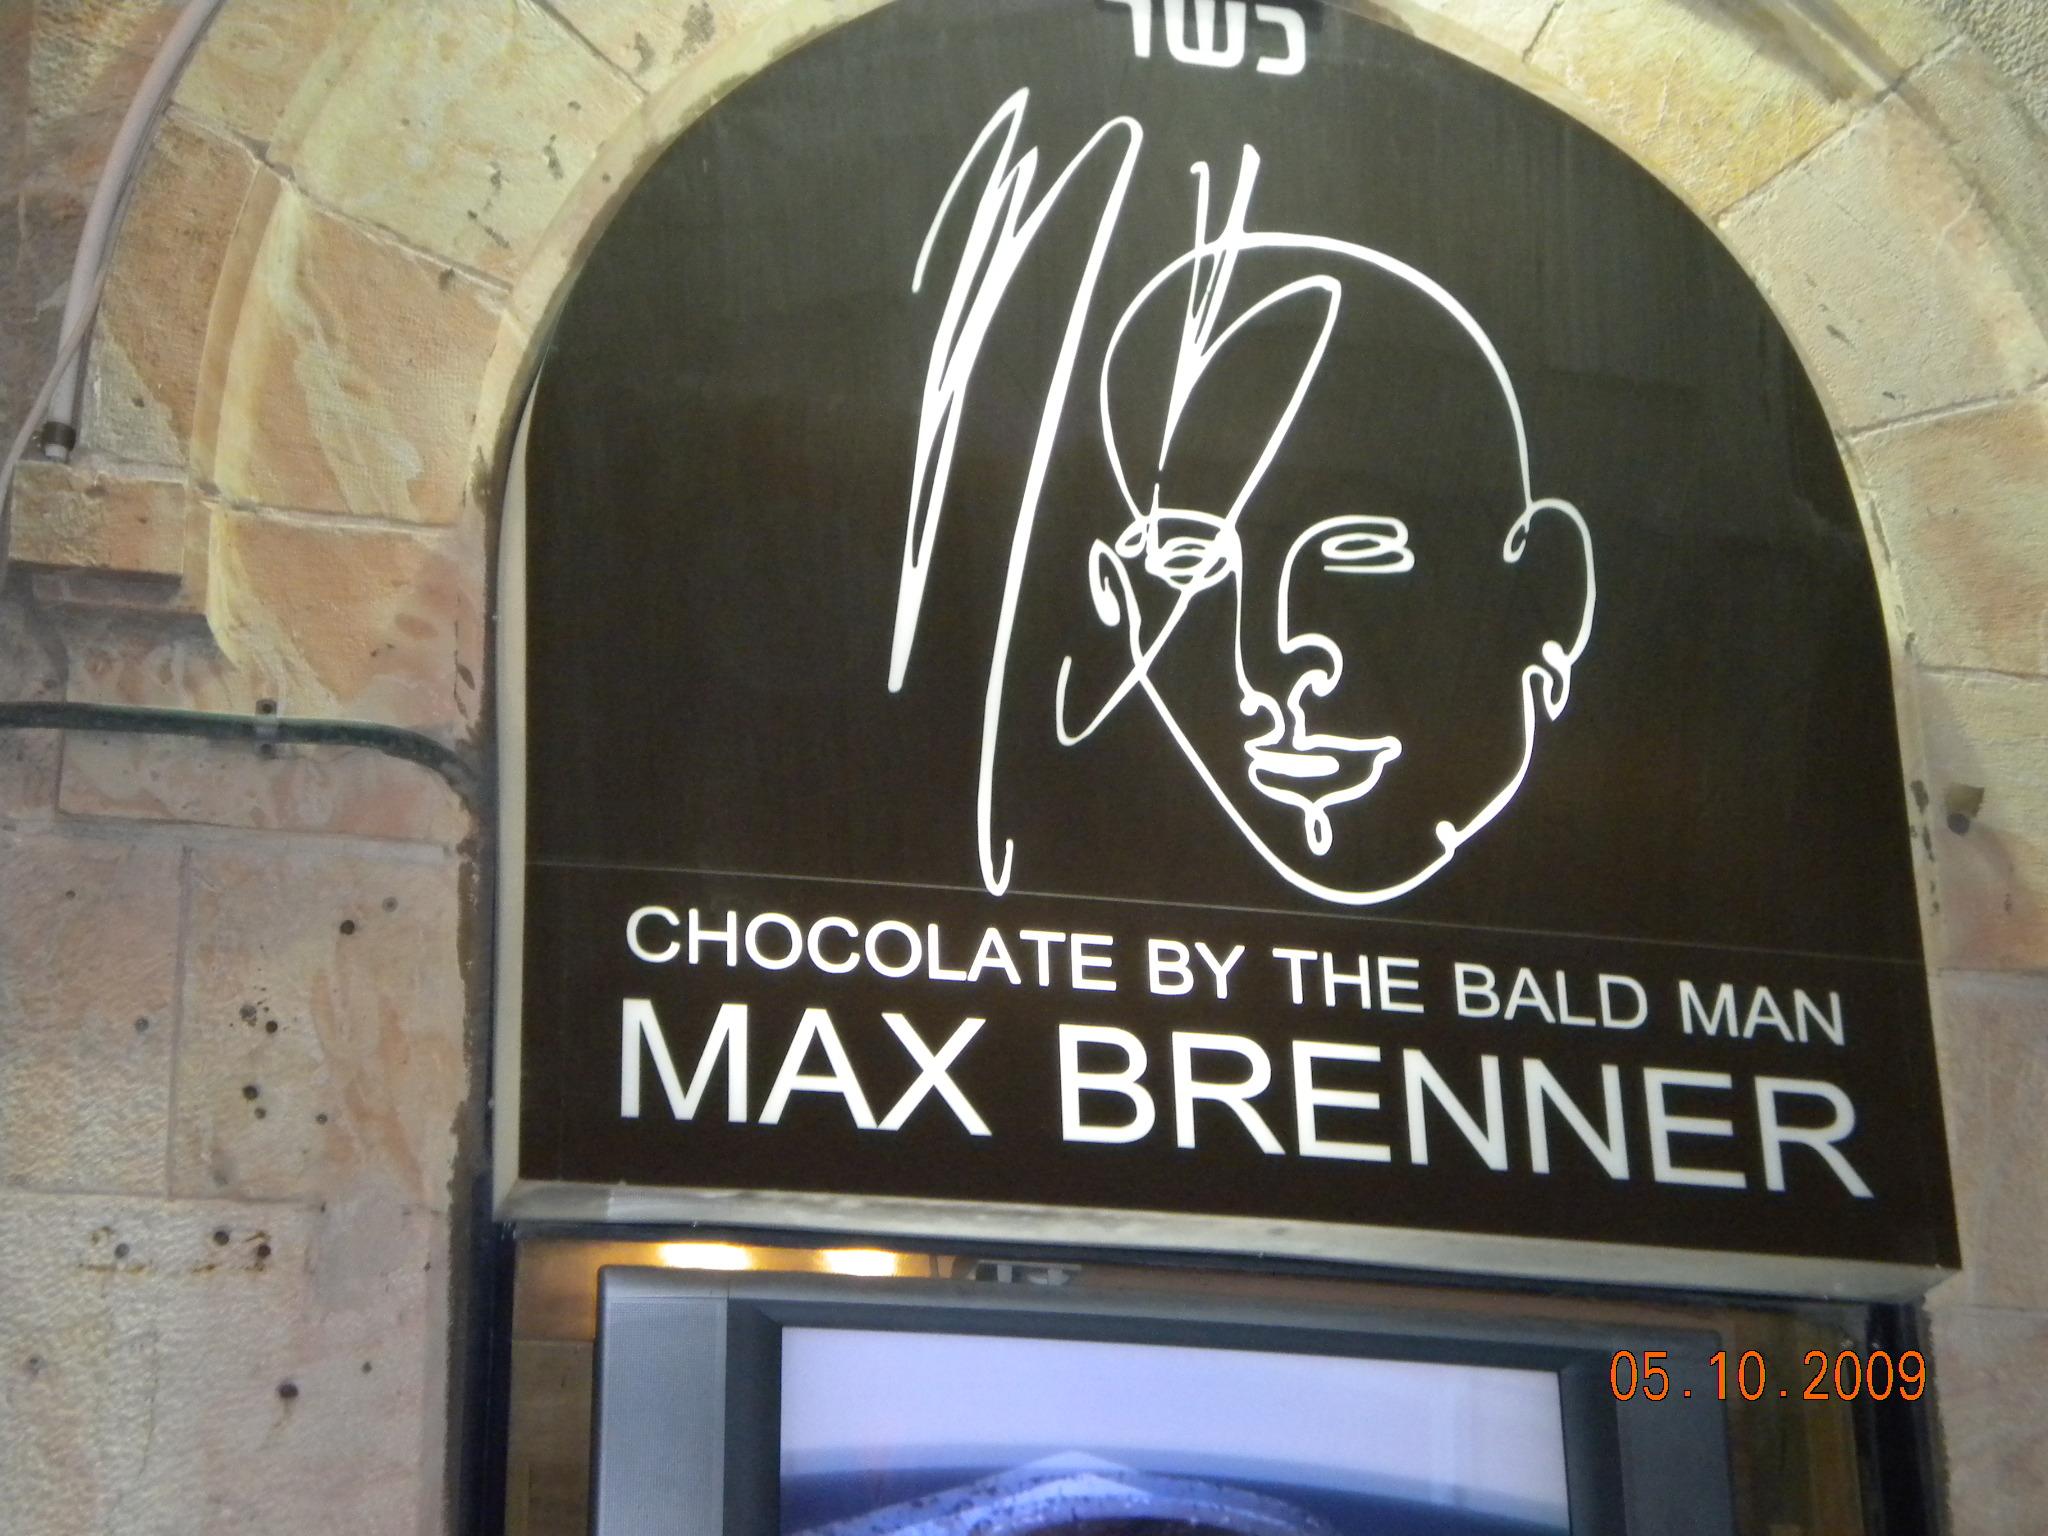 Aldo - Max Brenner sign over store entrance